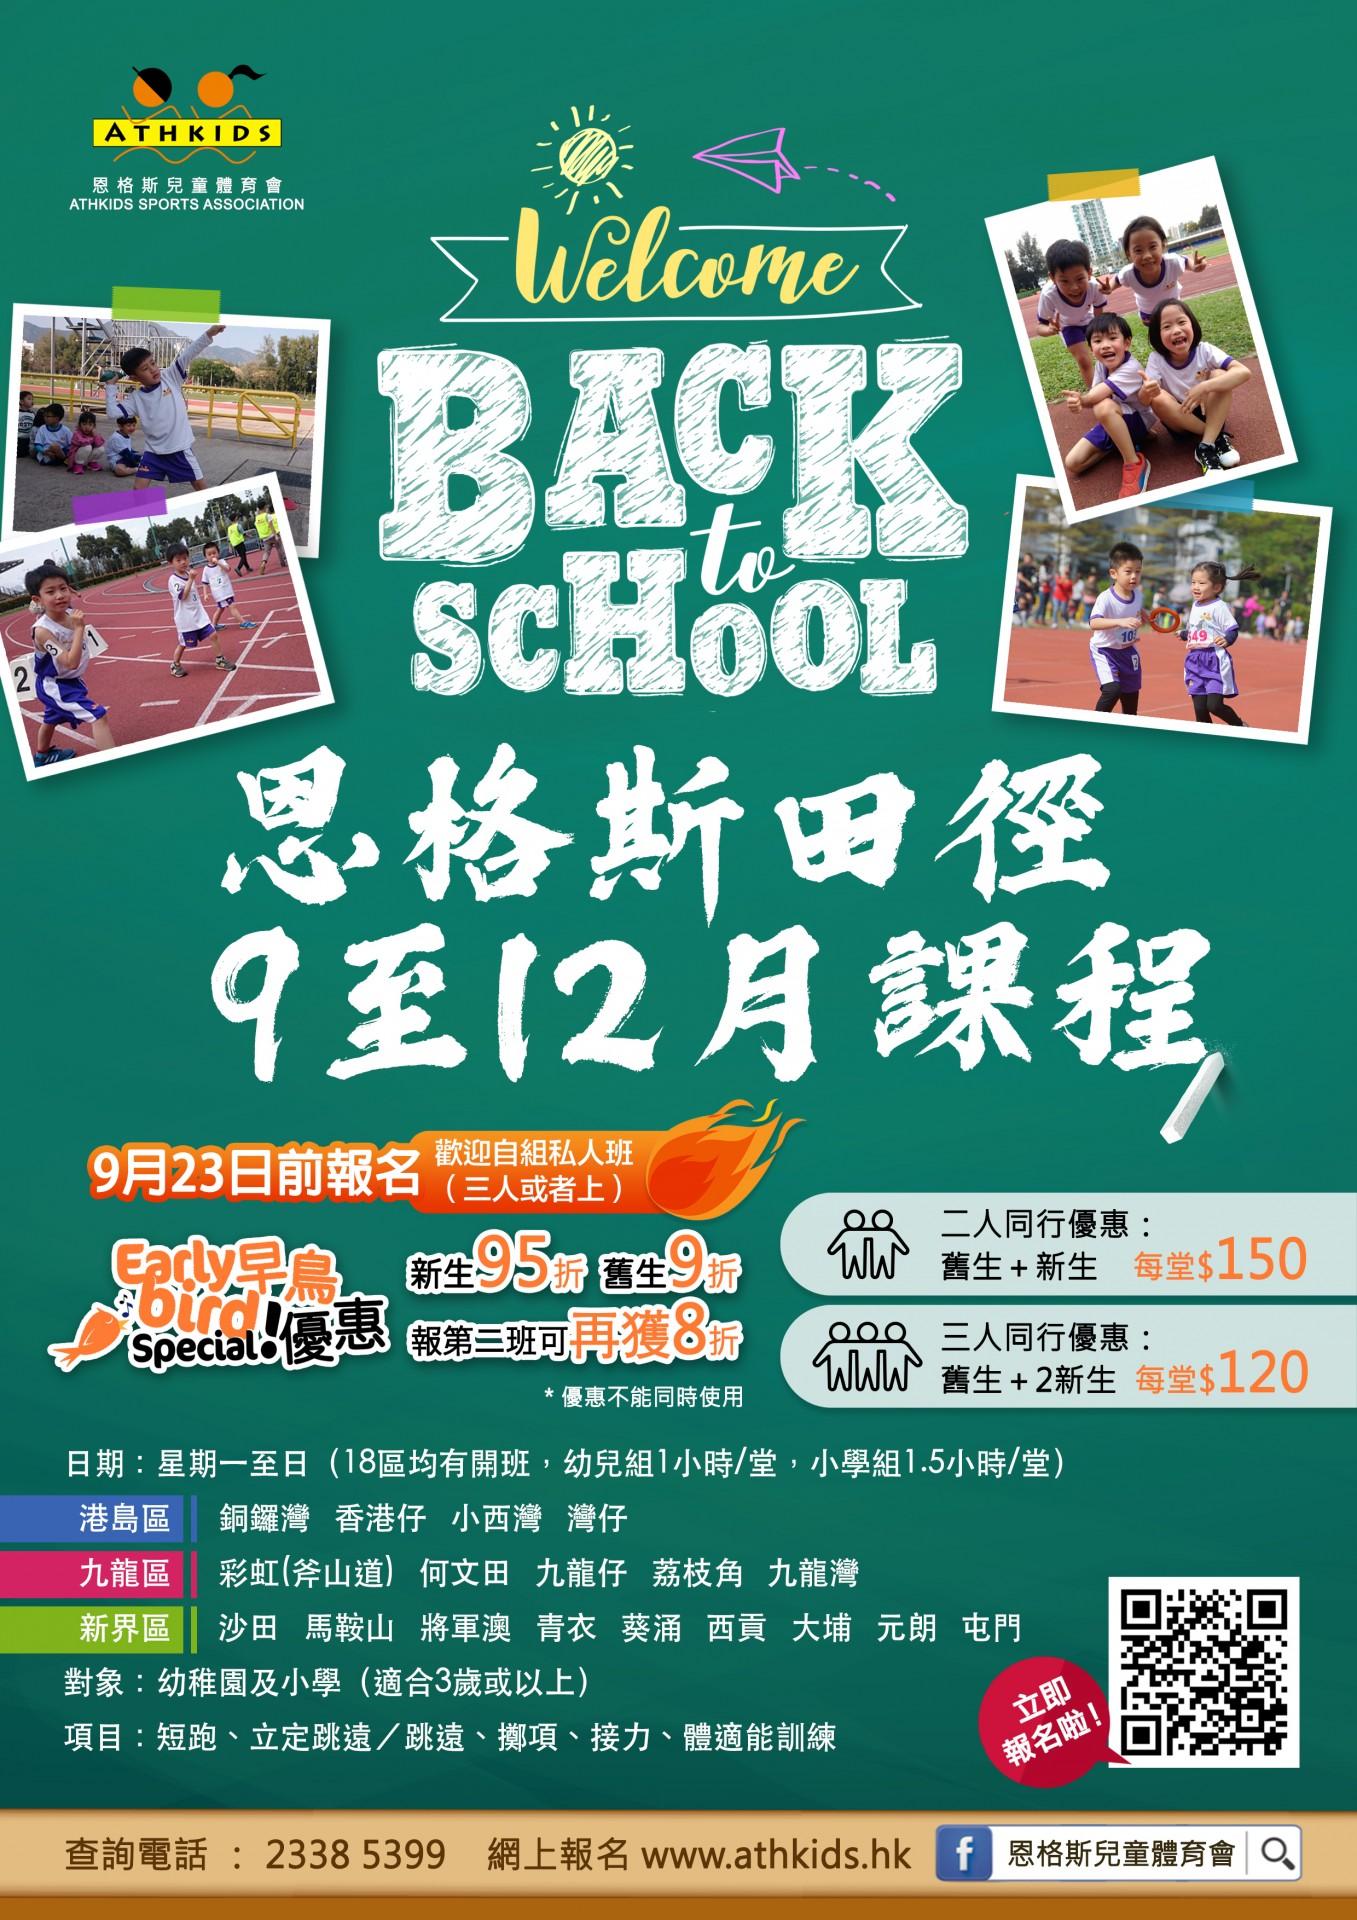 【恩格斯Back to School 9-12月田徑班】